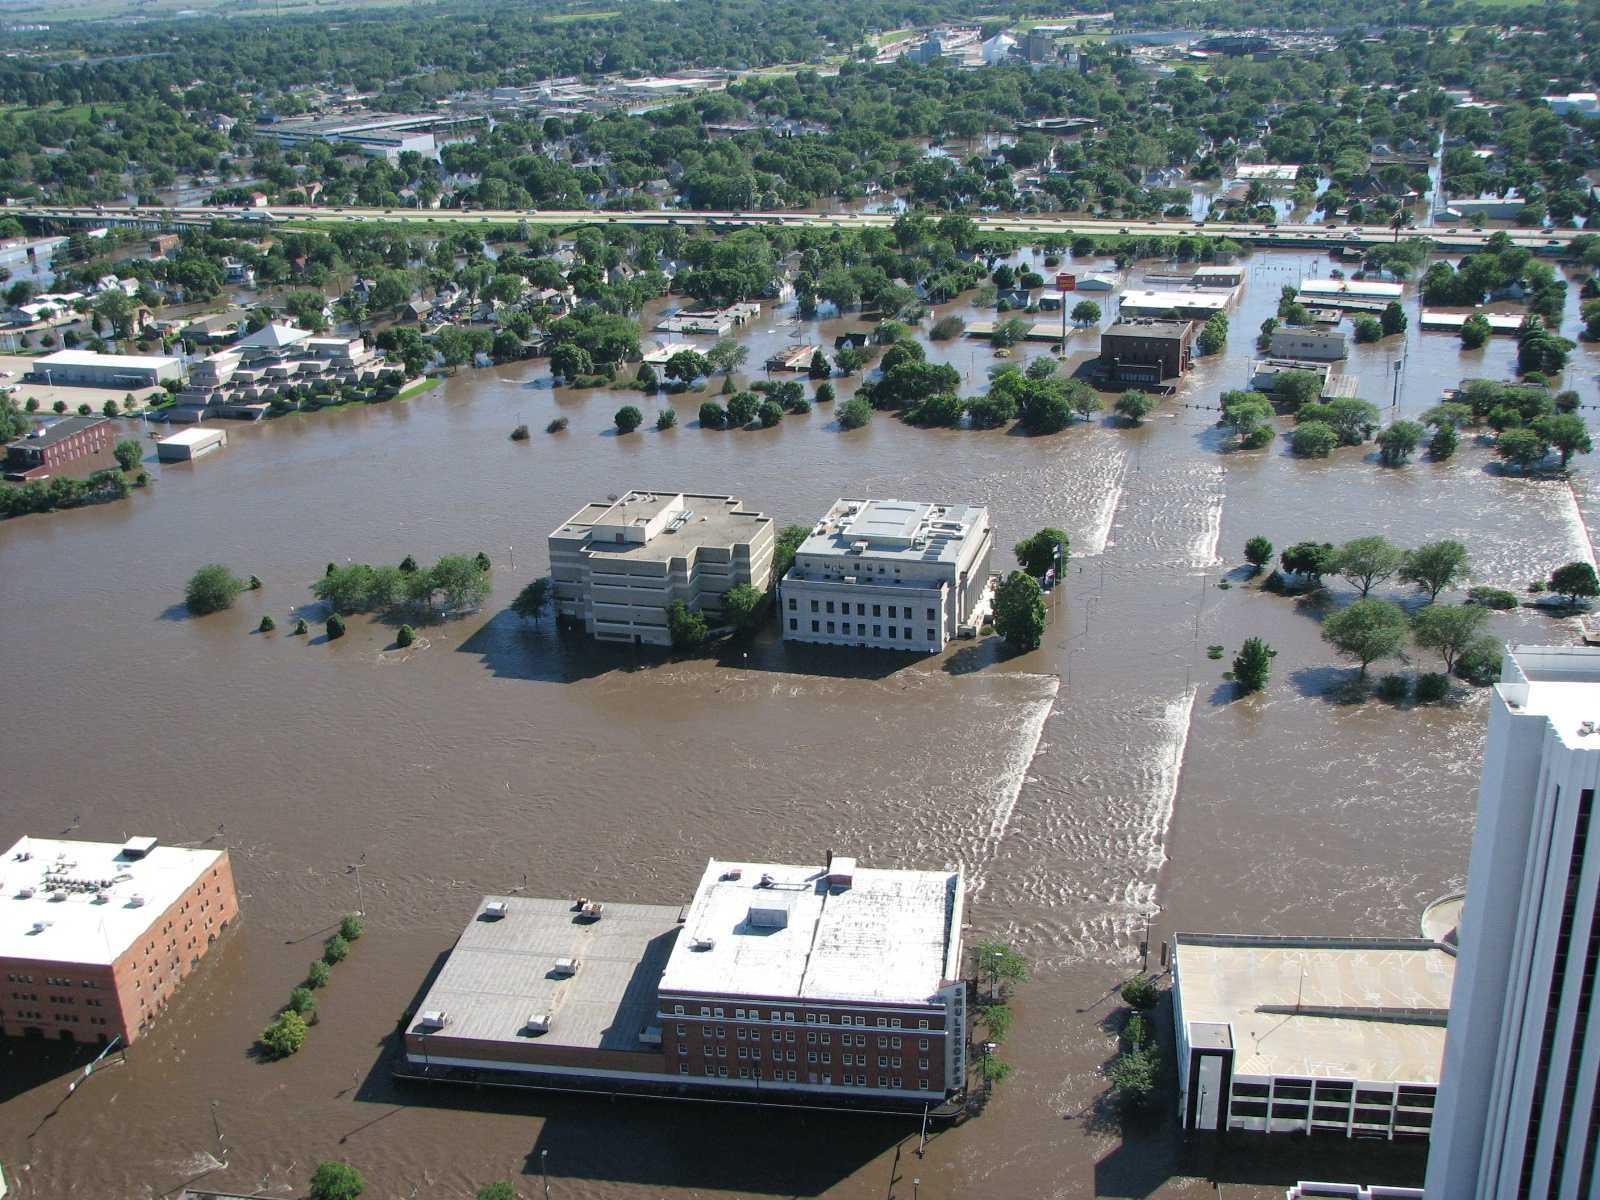 May 7, 2015 Update to Cedar Rapids Flood Class Action Case